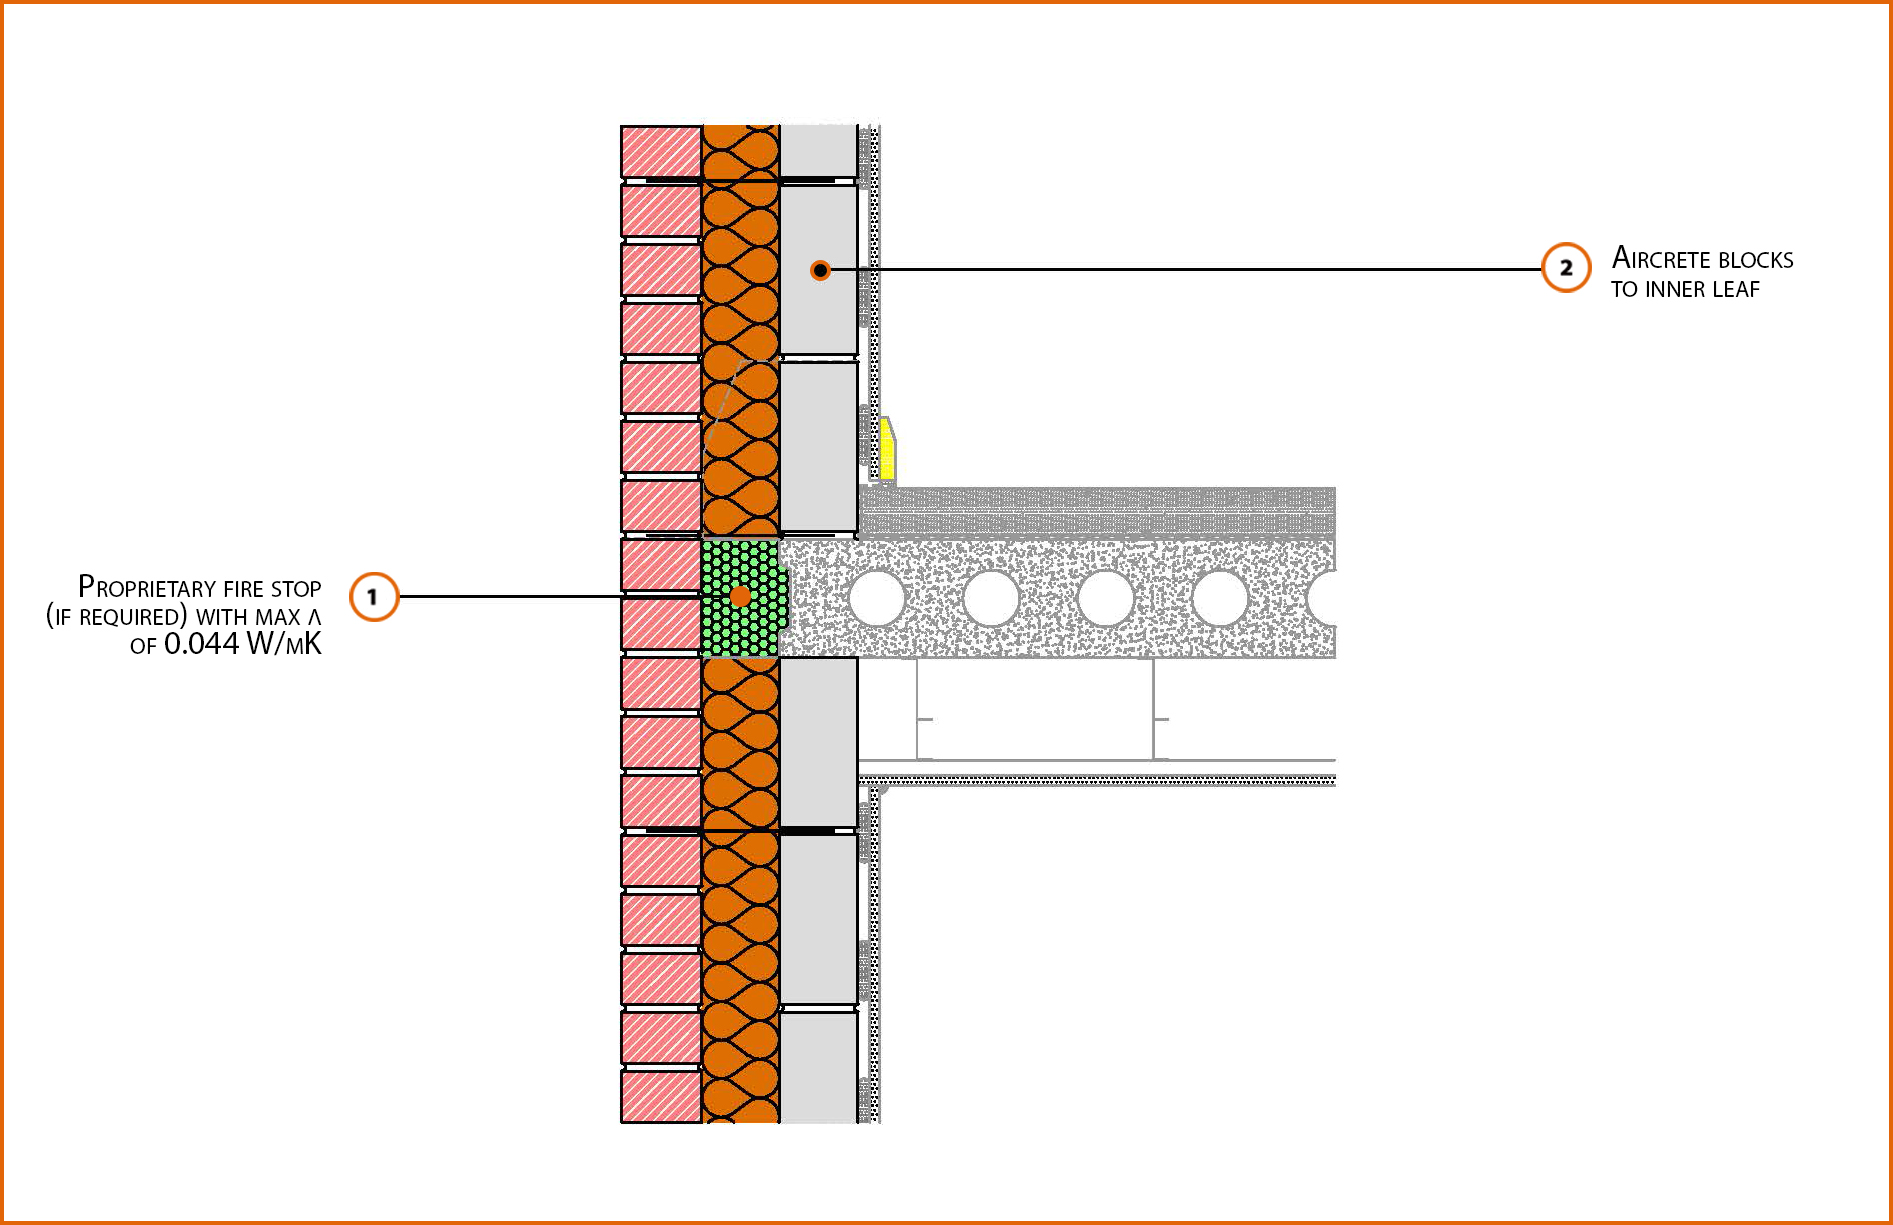 E7mcff4 Precast Concrete Separating Floor Between